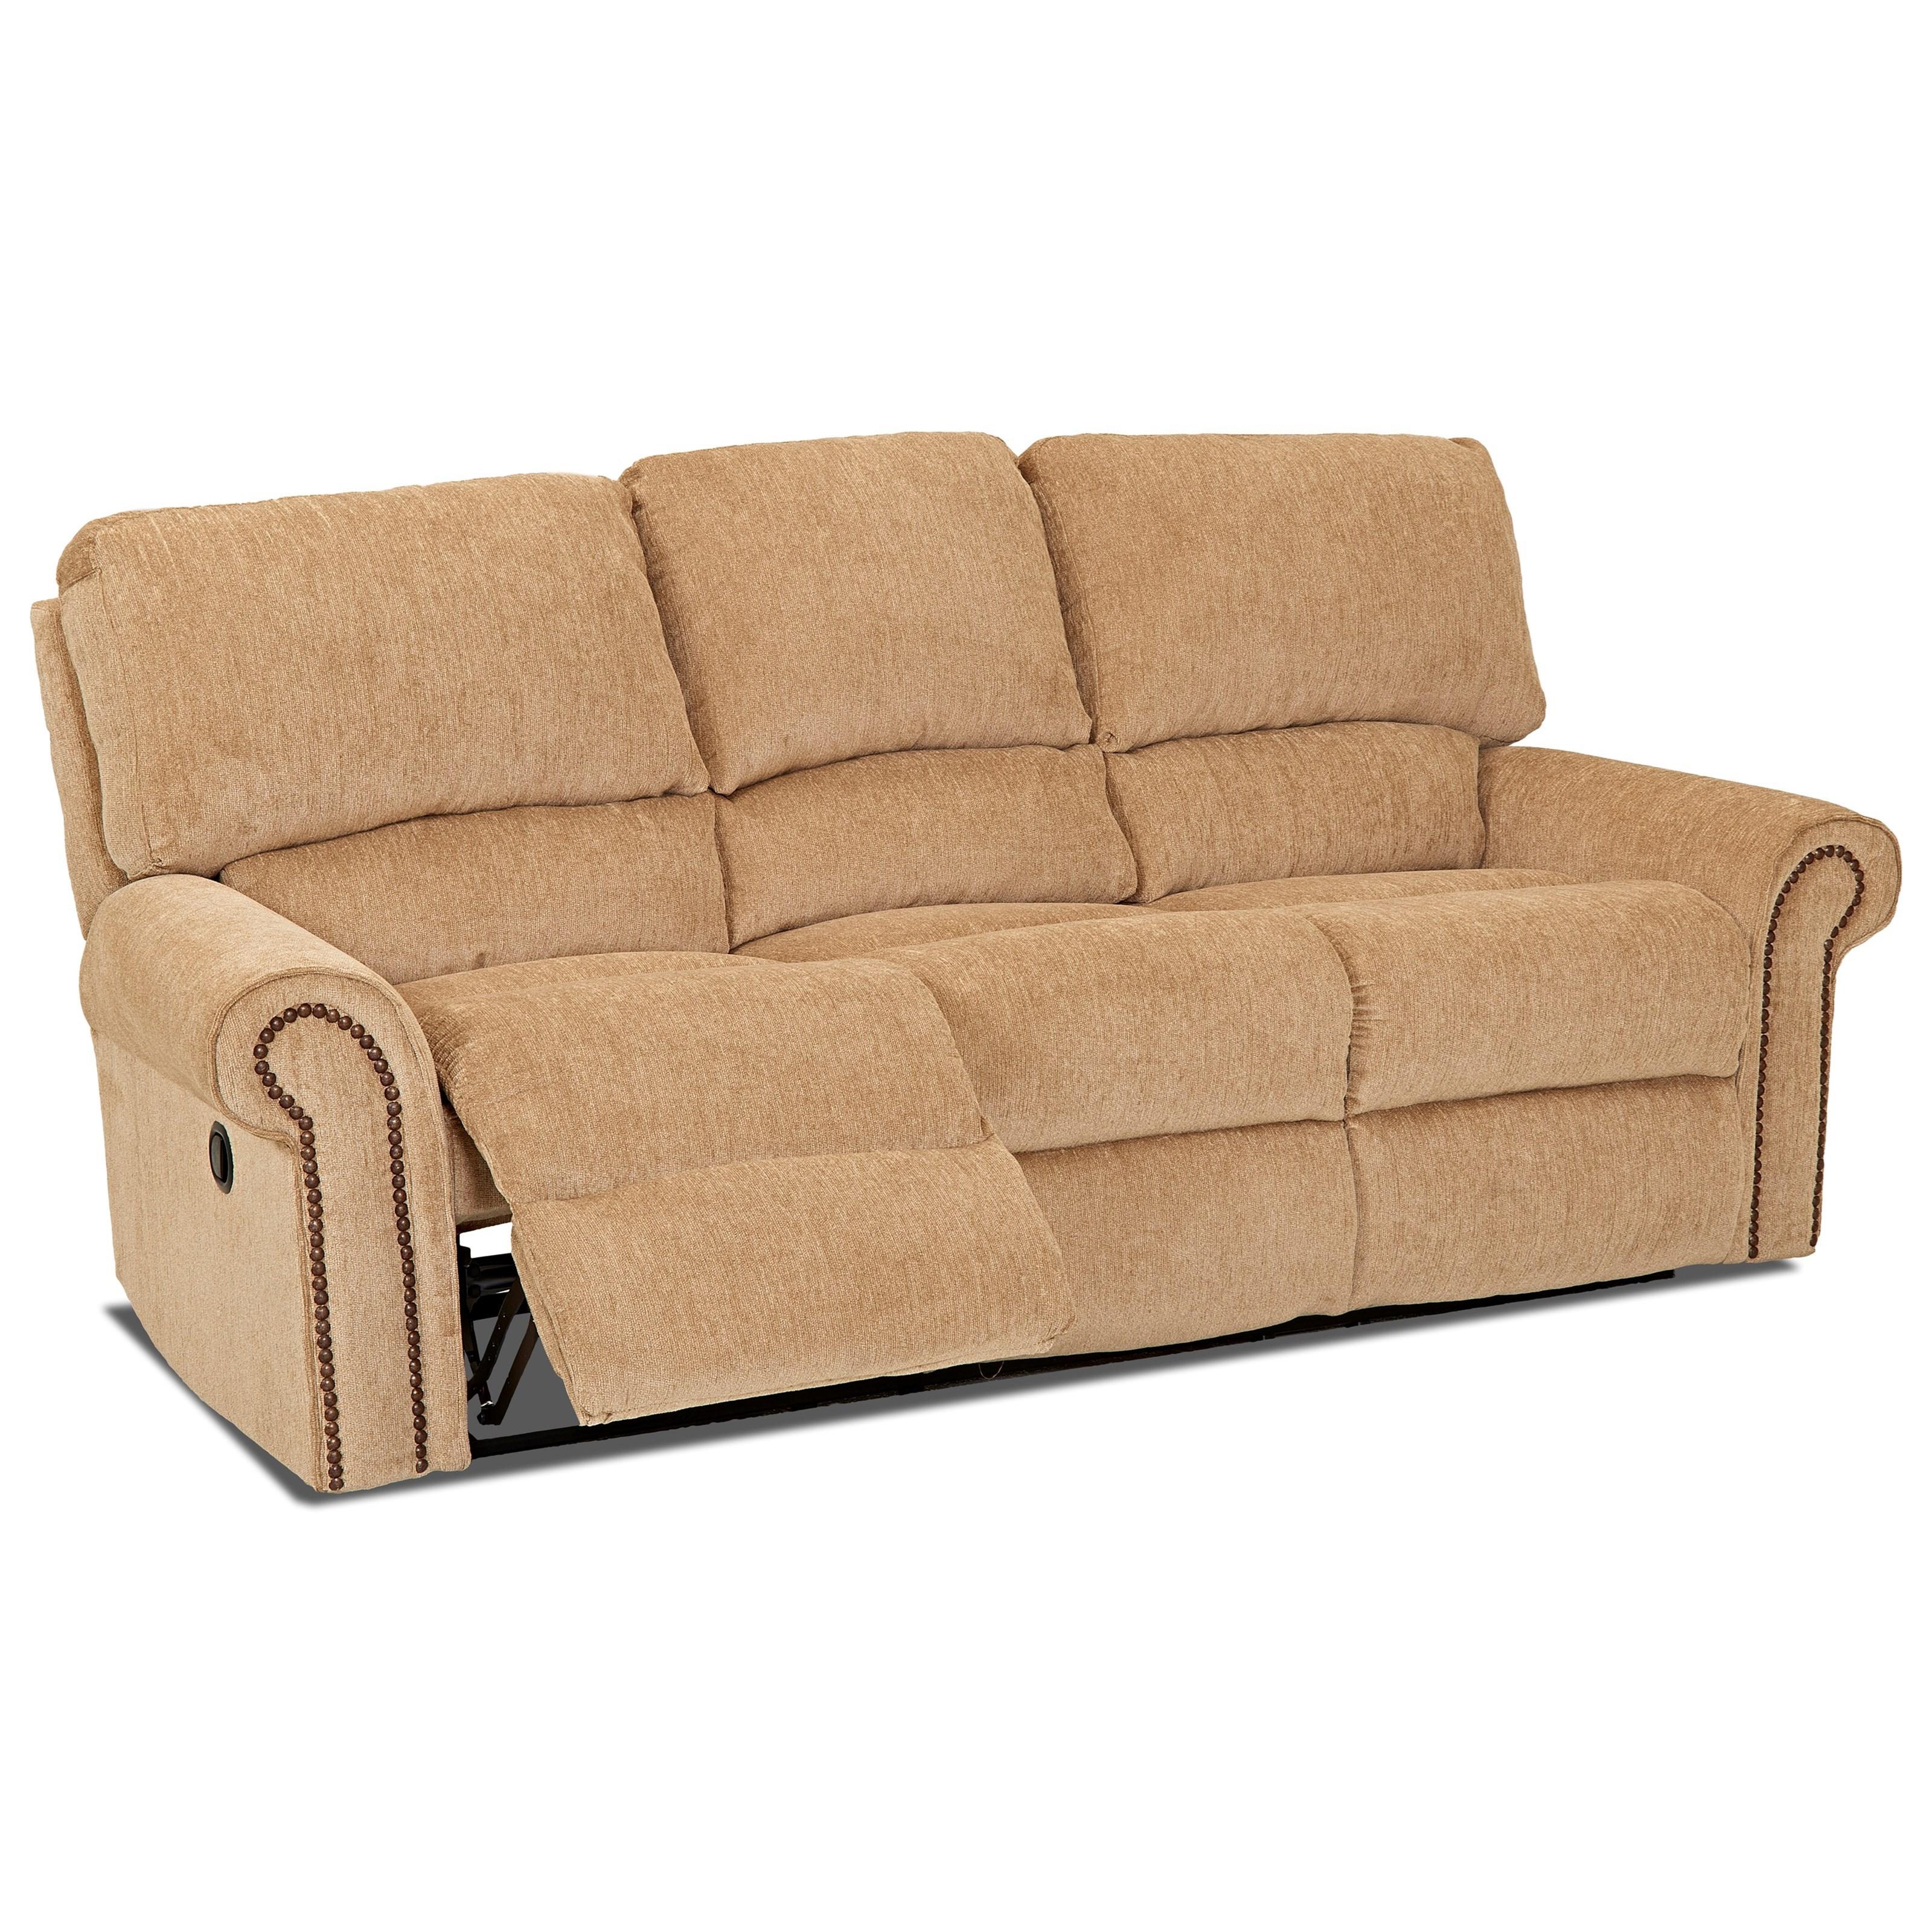 Klaussner Savannah 62413 Pwrs Power Reclining Sofa With